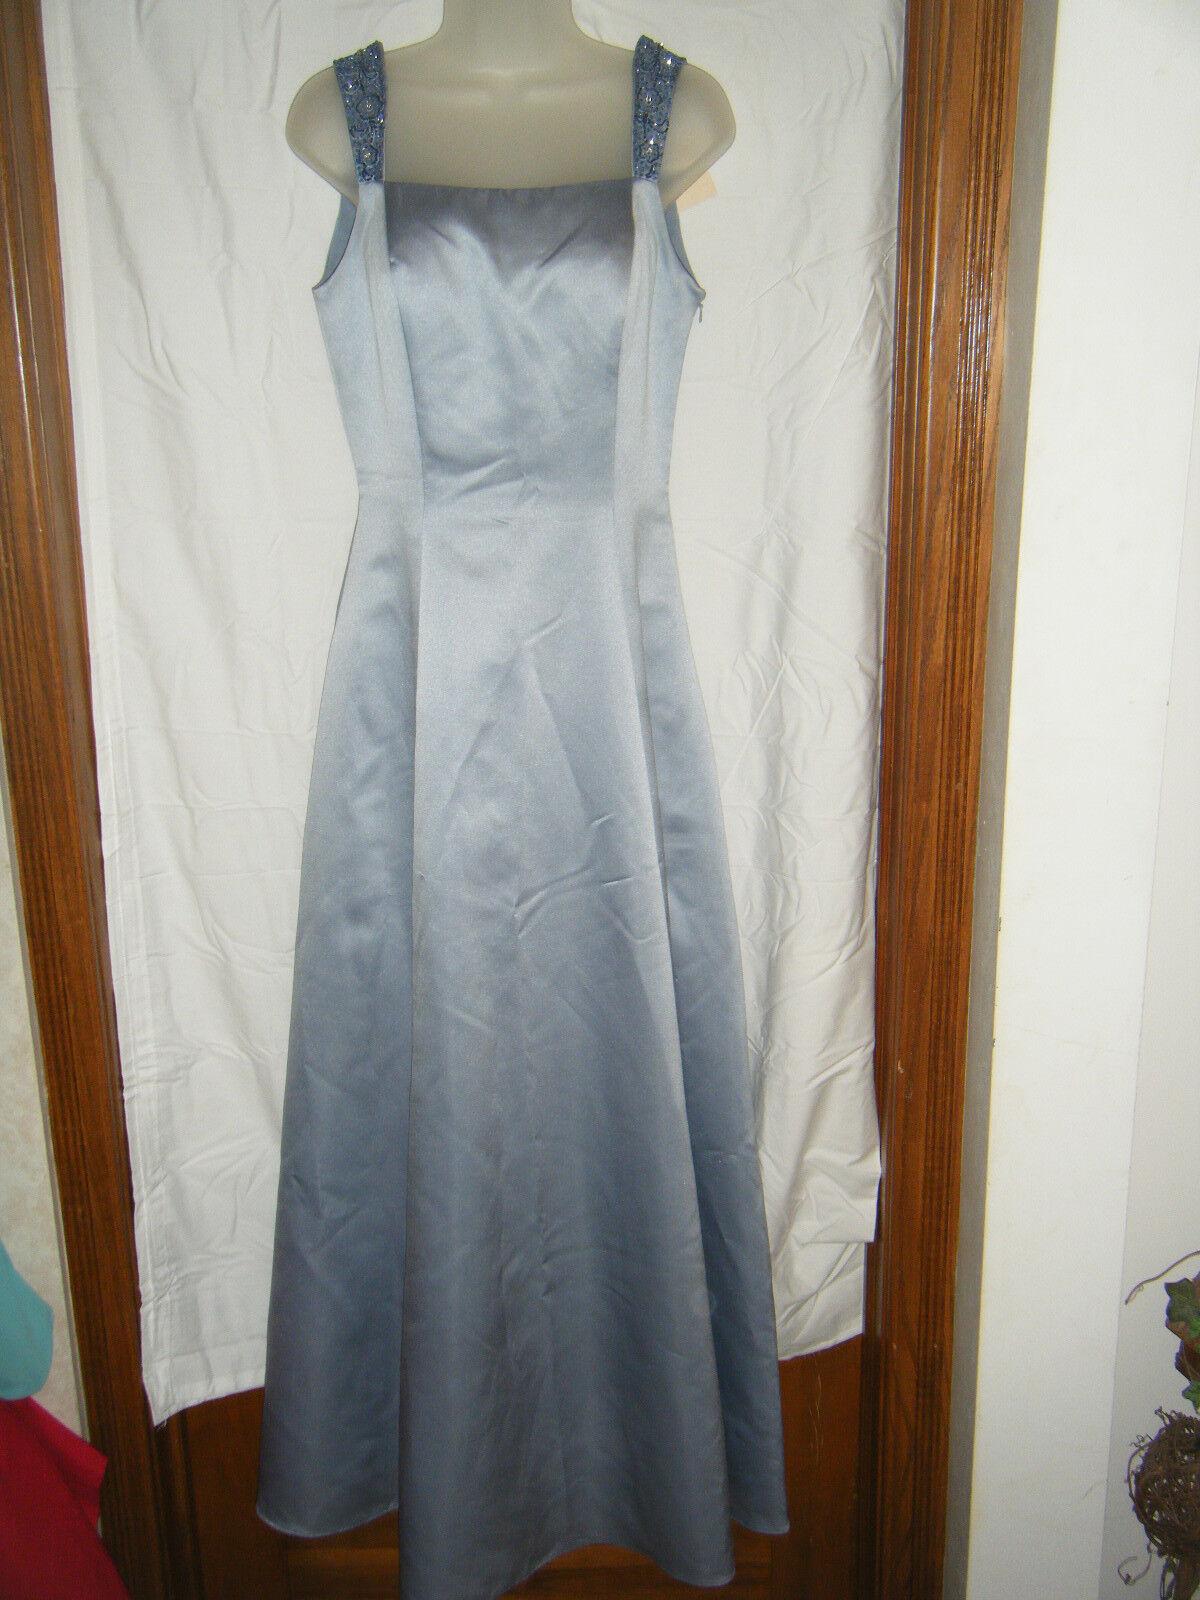 Ladies Precious Formals Satin Evening Dress w Beaded Straps - Size 6